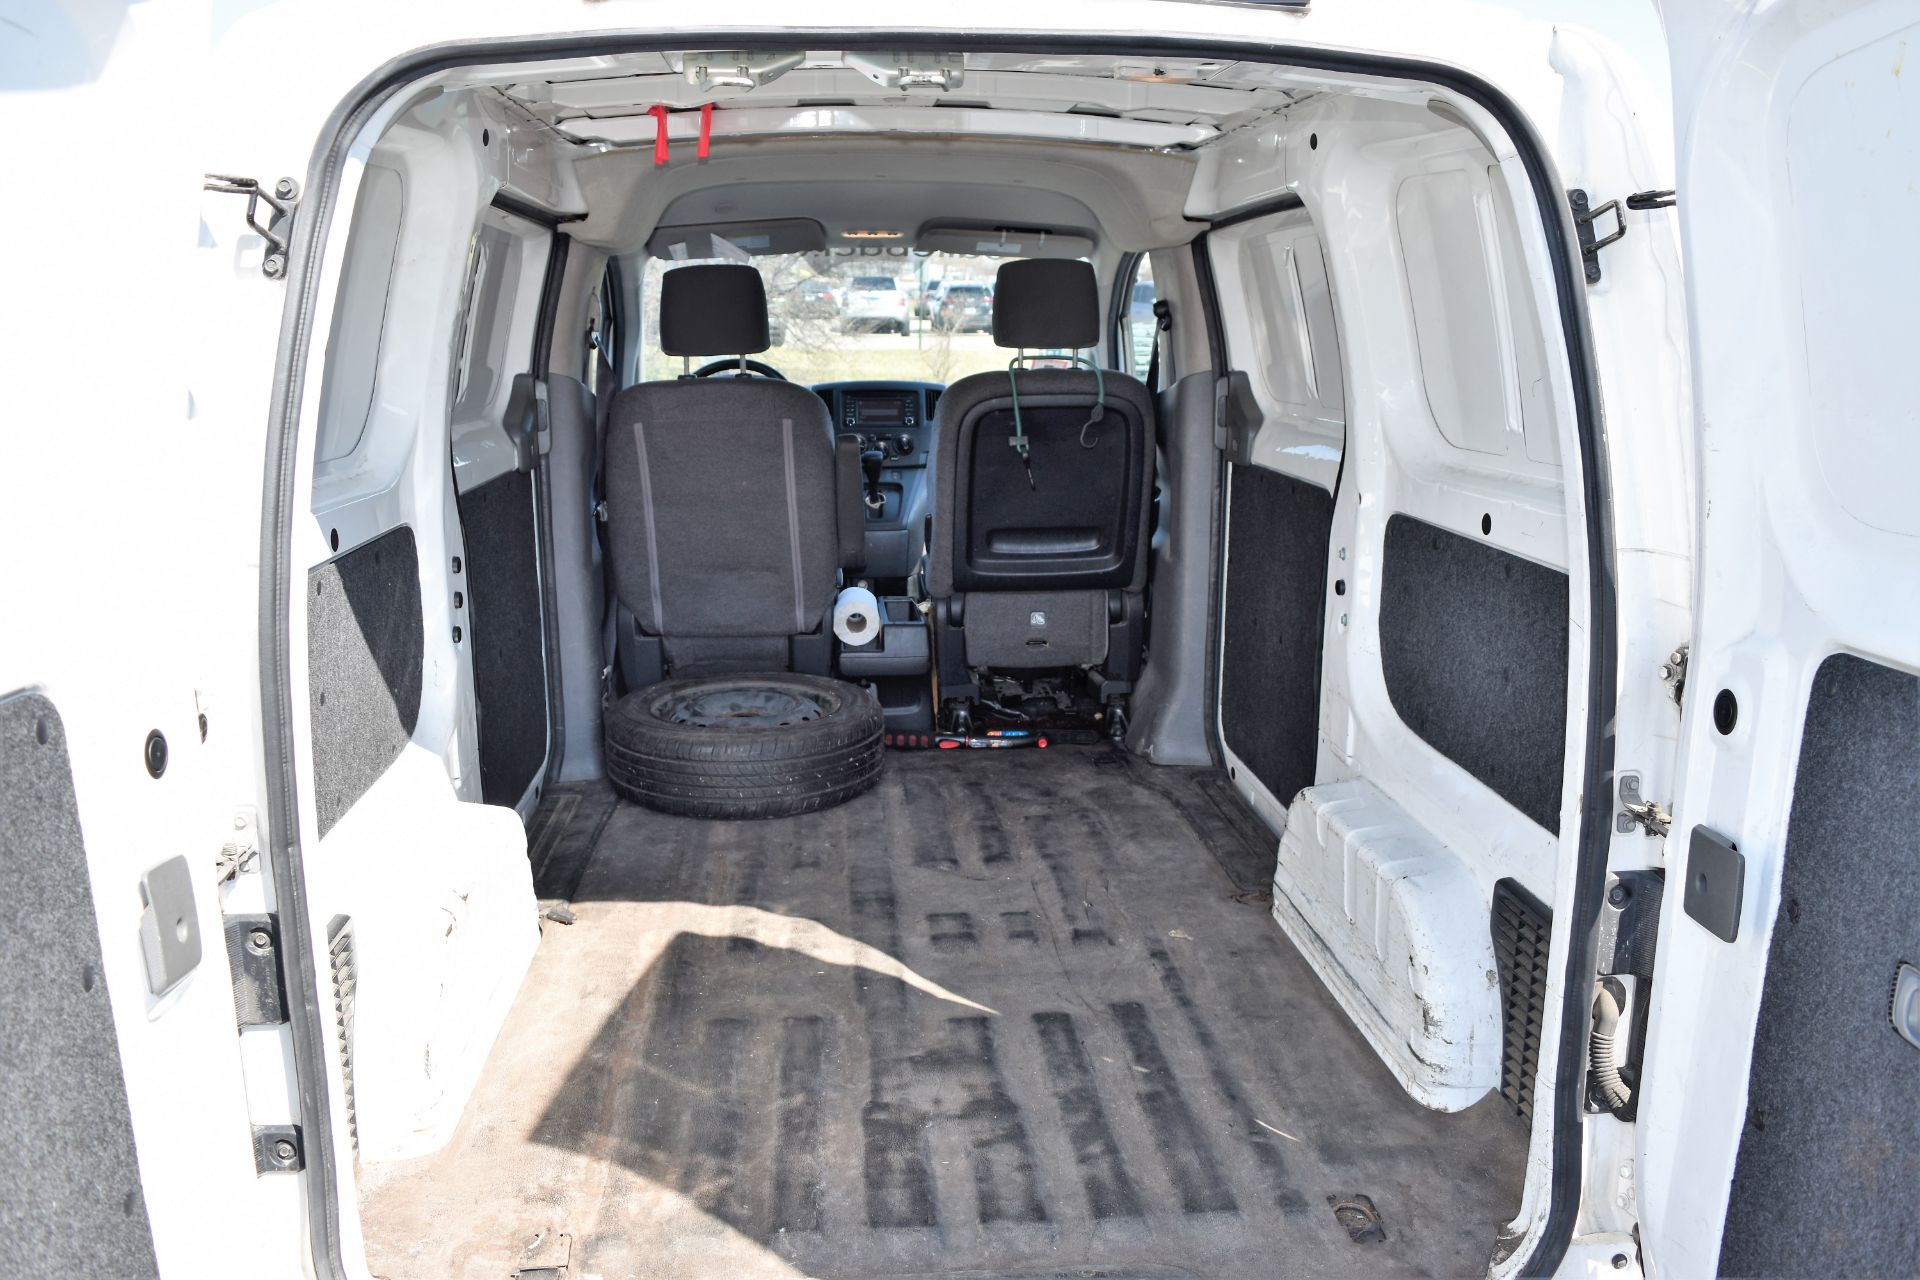 2013 Nissan NV200 Delivery Van - Image 40 of 54